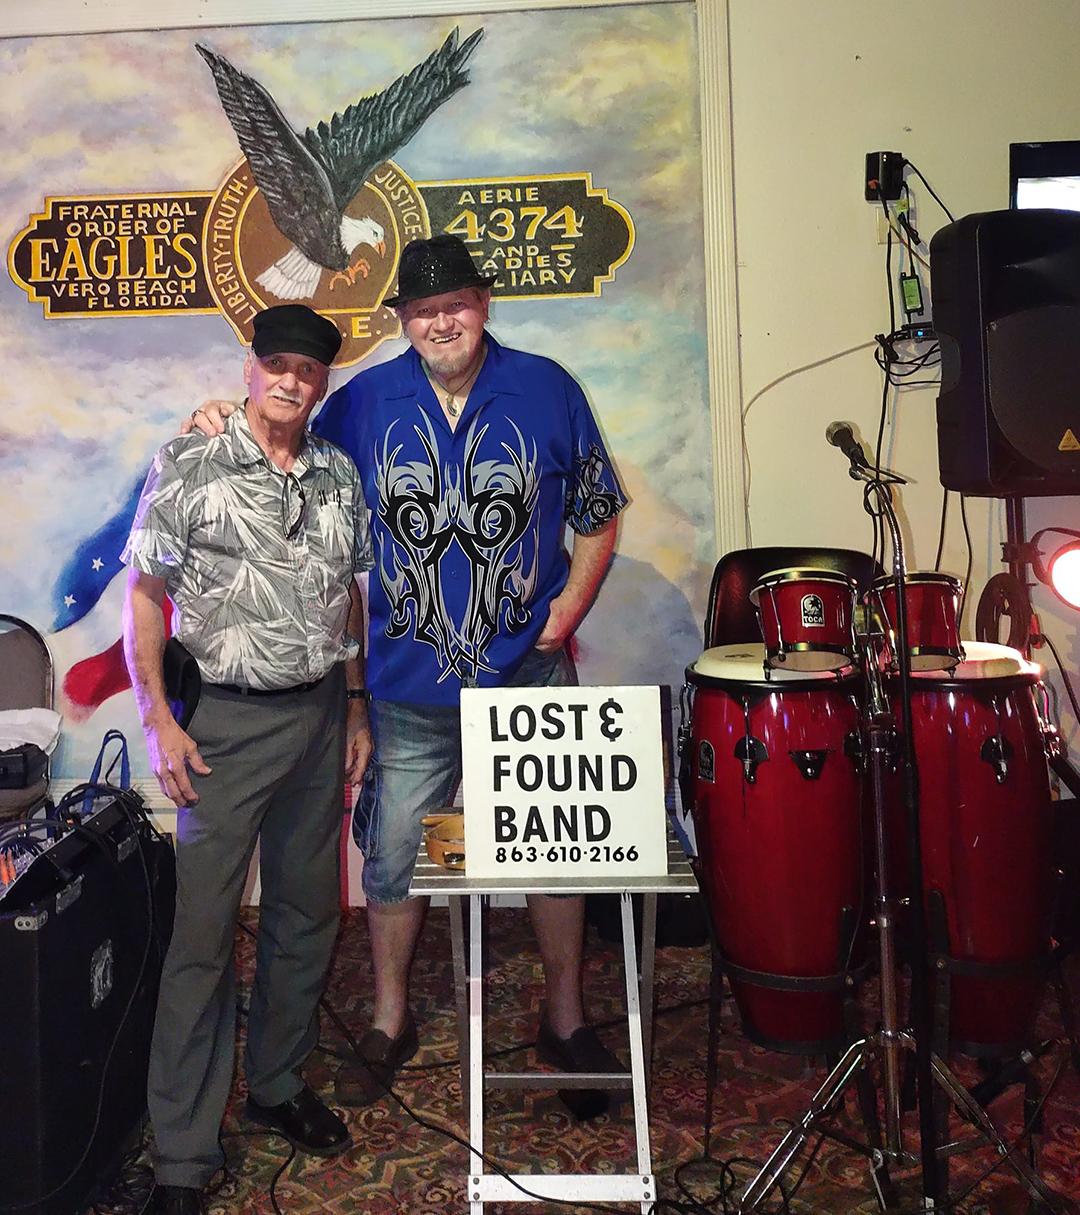 Lost & Found Band at the Vero Beach Eagles